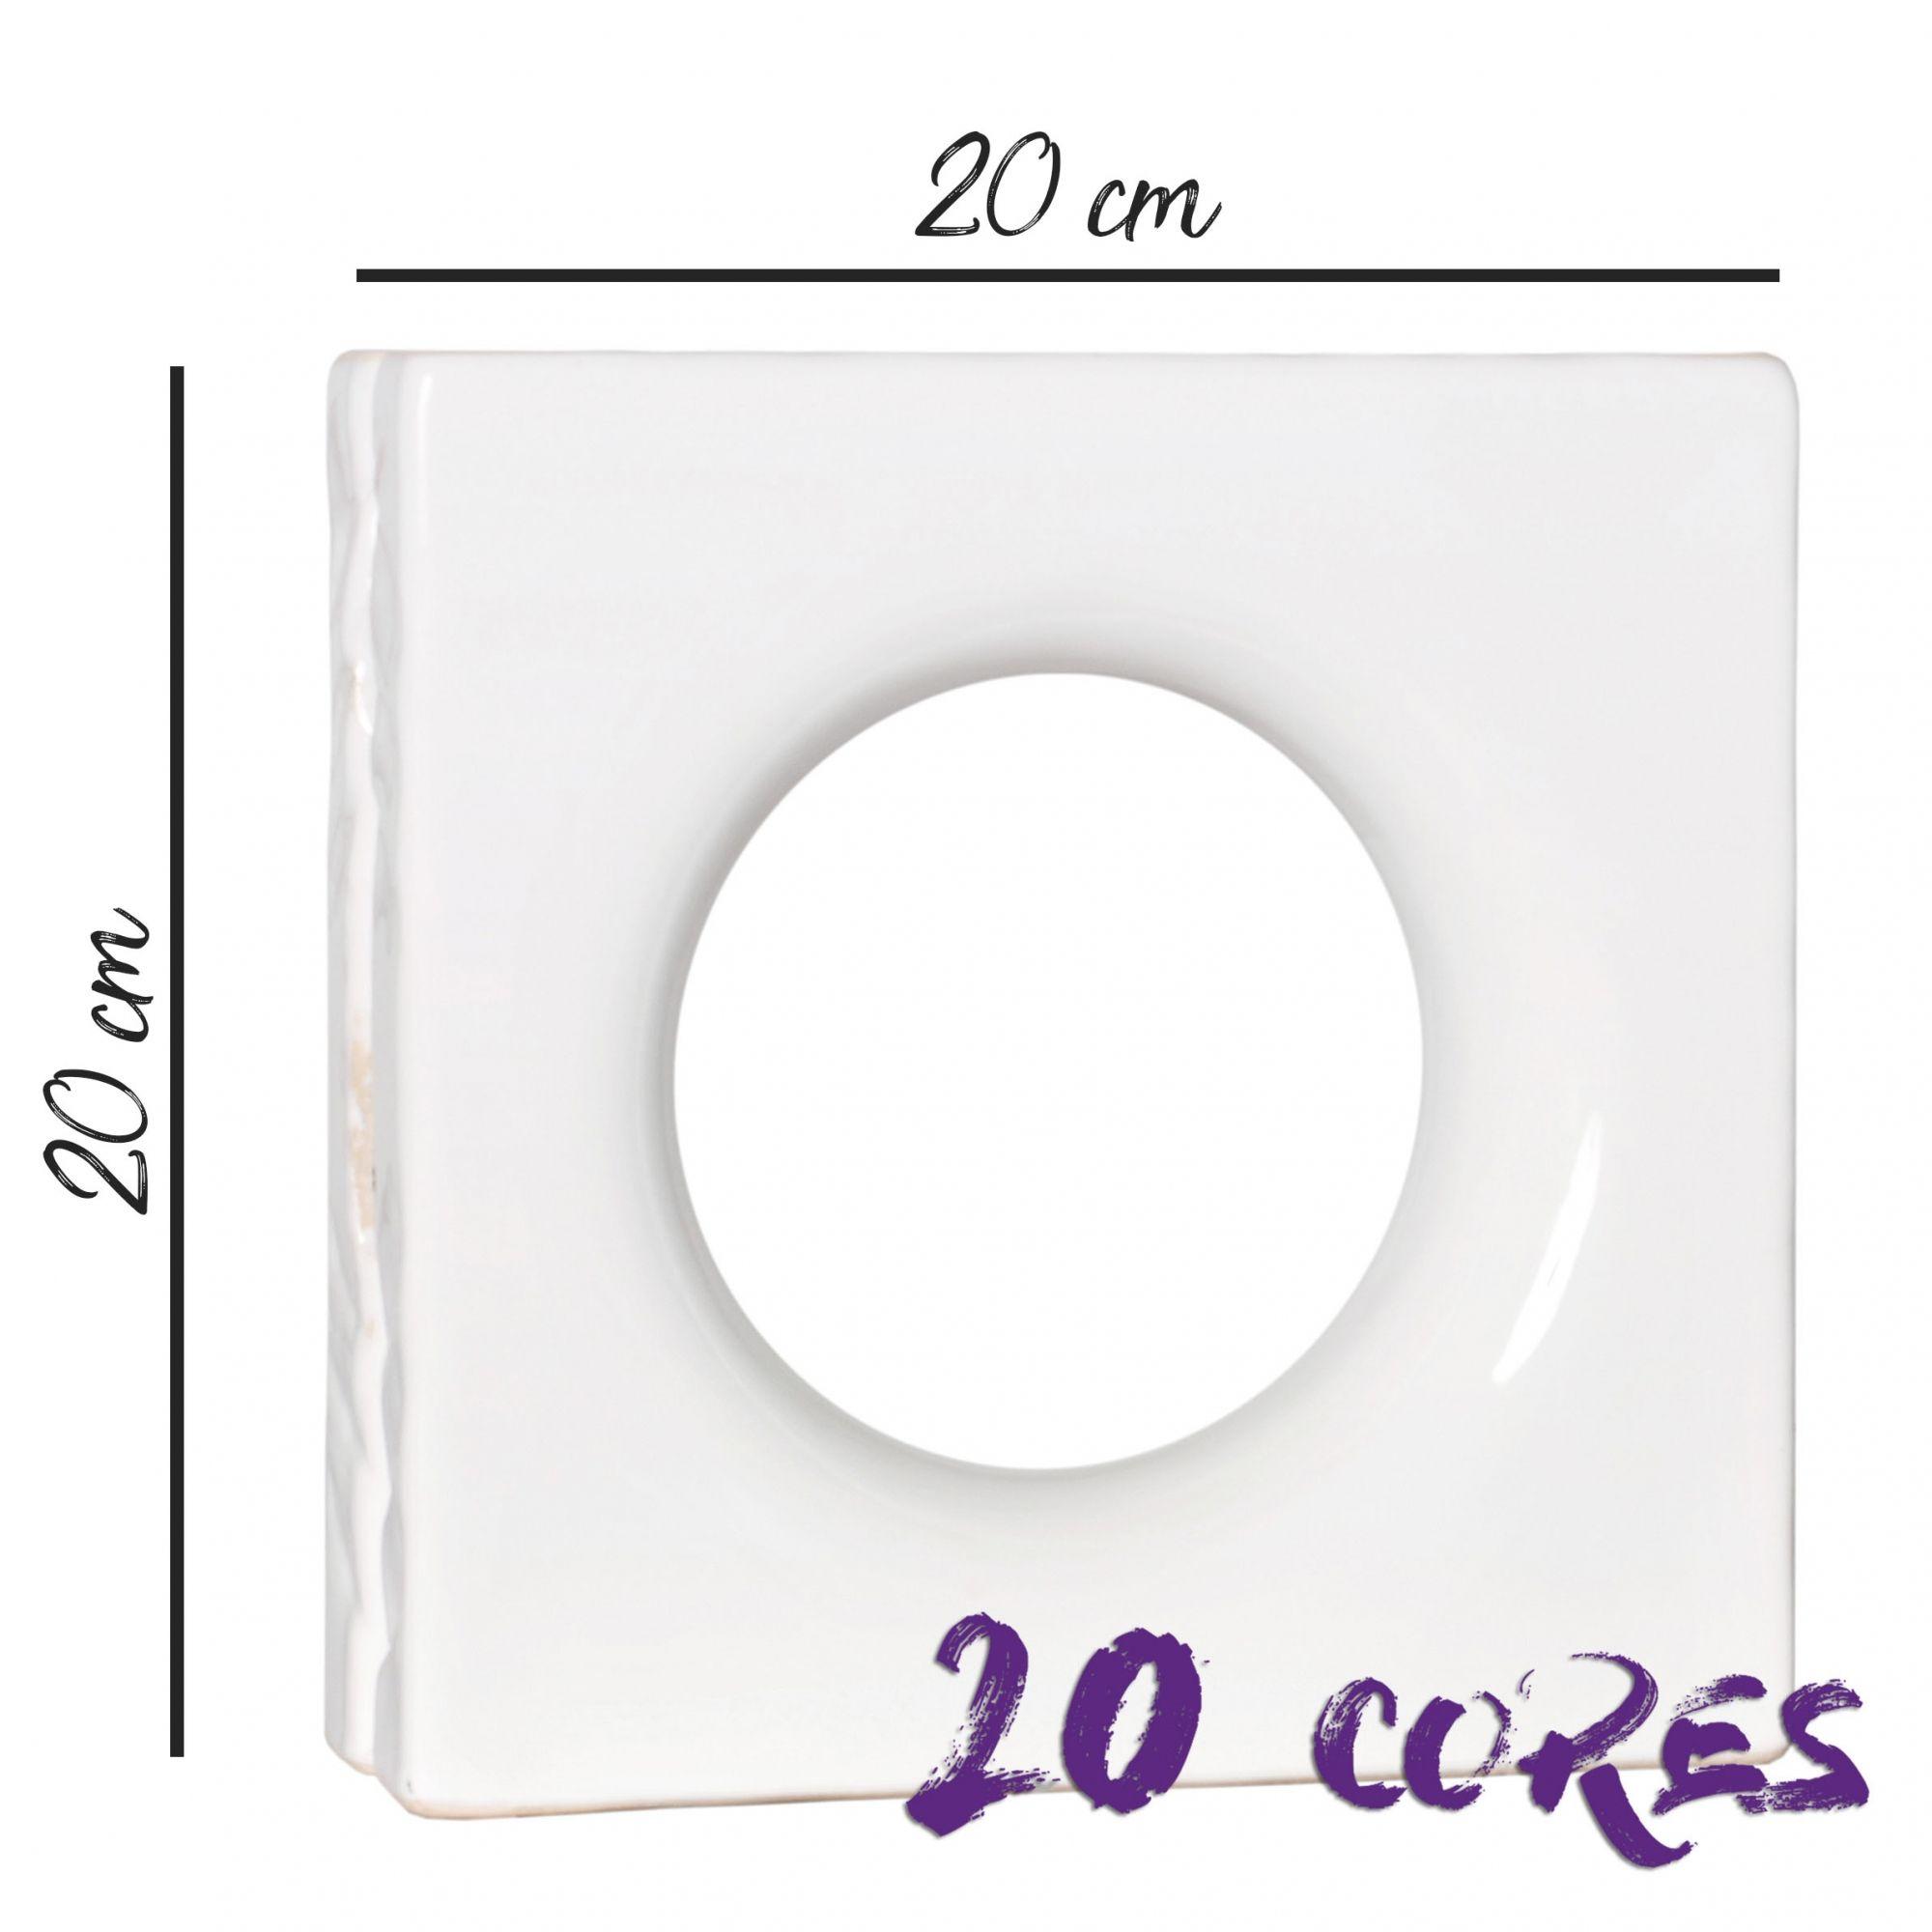 Cobogó Mini Lua - 20 cores - 20x20 cm